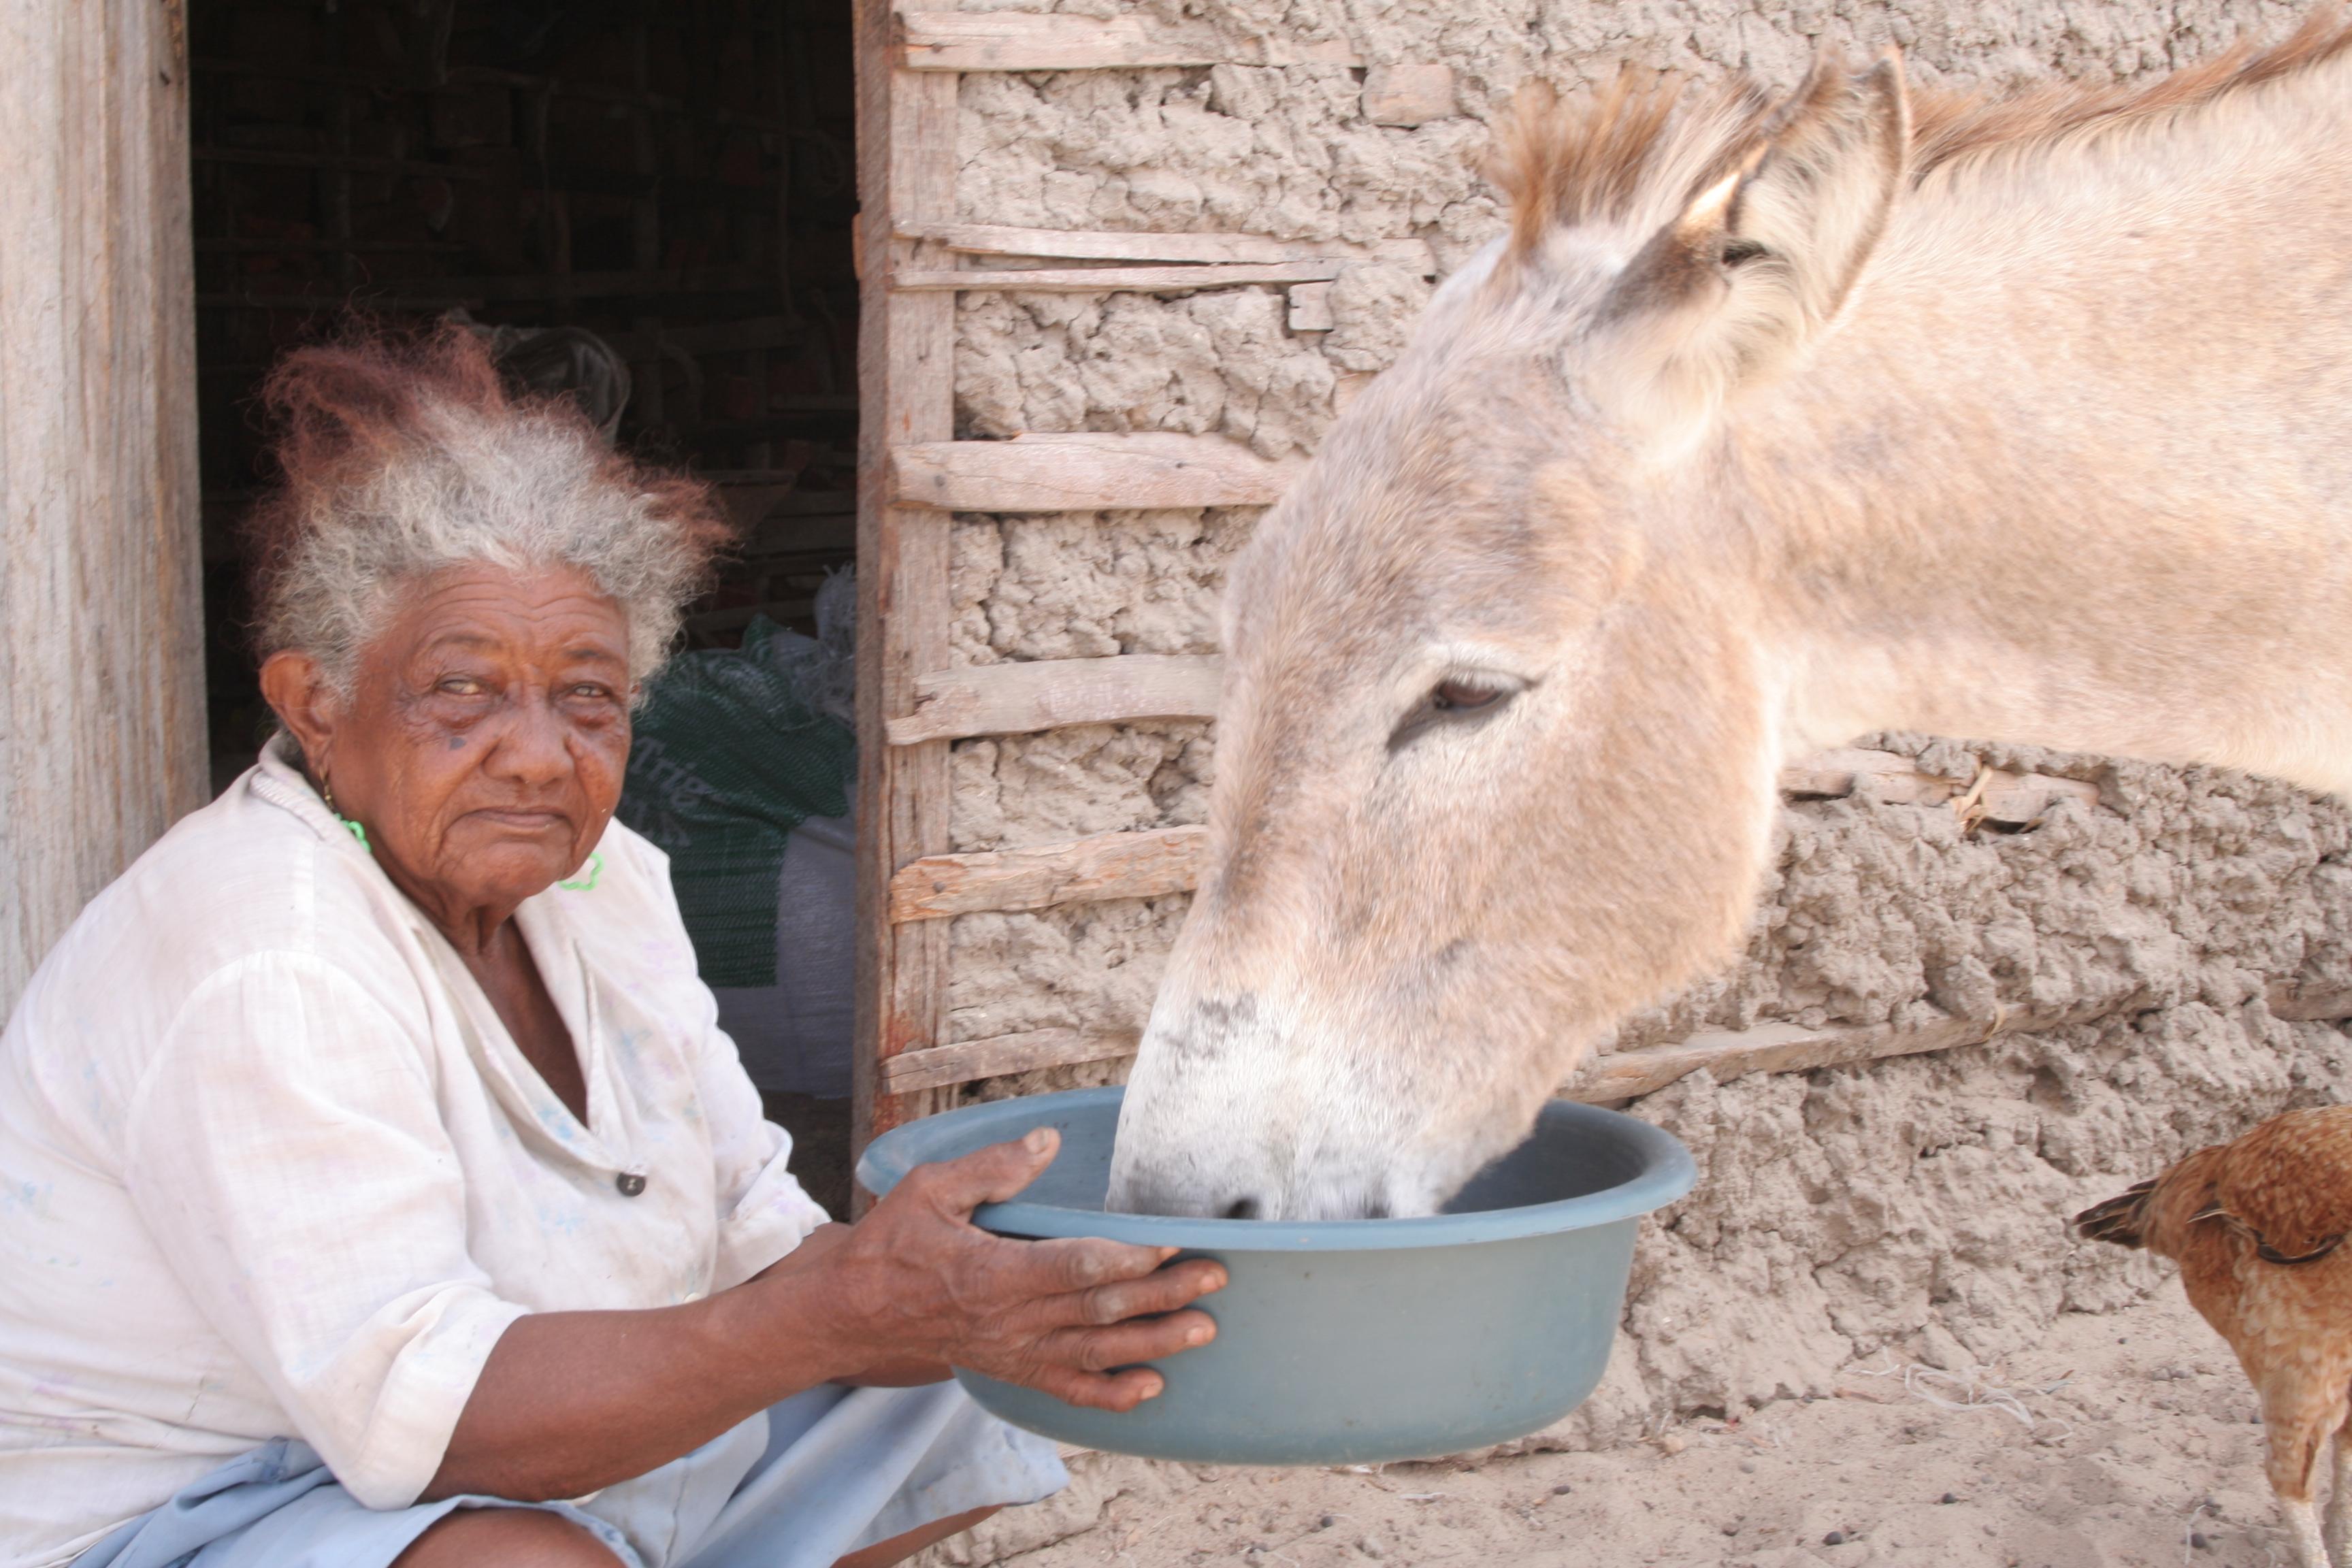 The Sea of pilgrim Antonio - Maria Altina (92) feeds one of her donkeys.